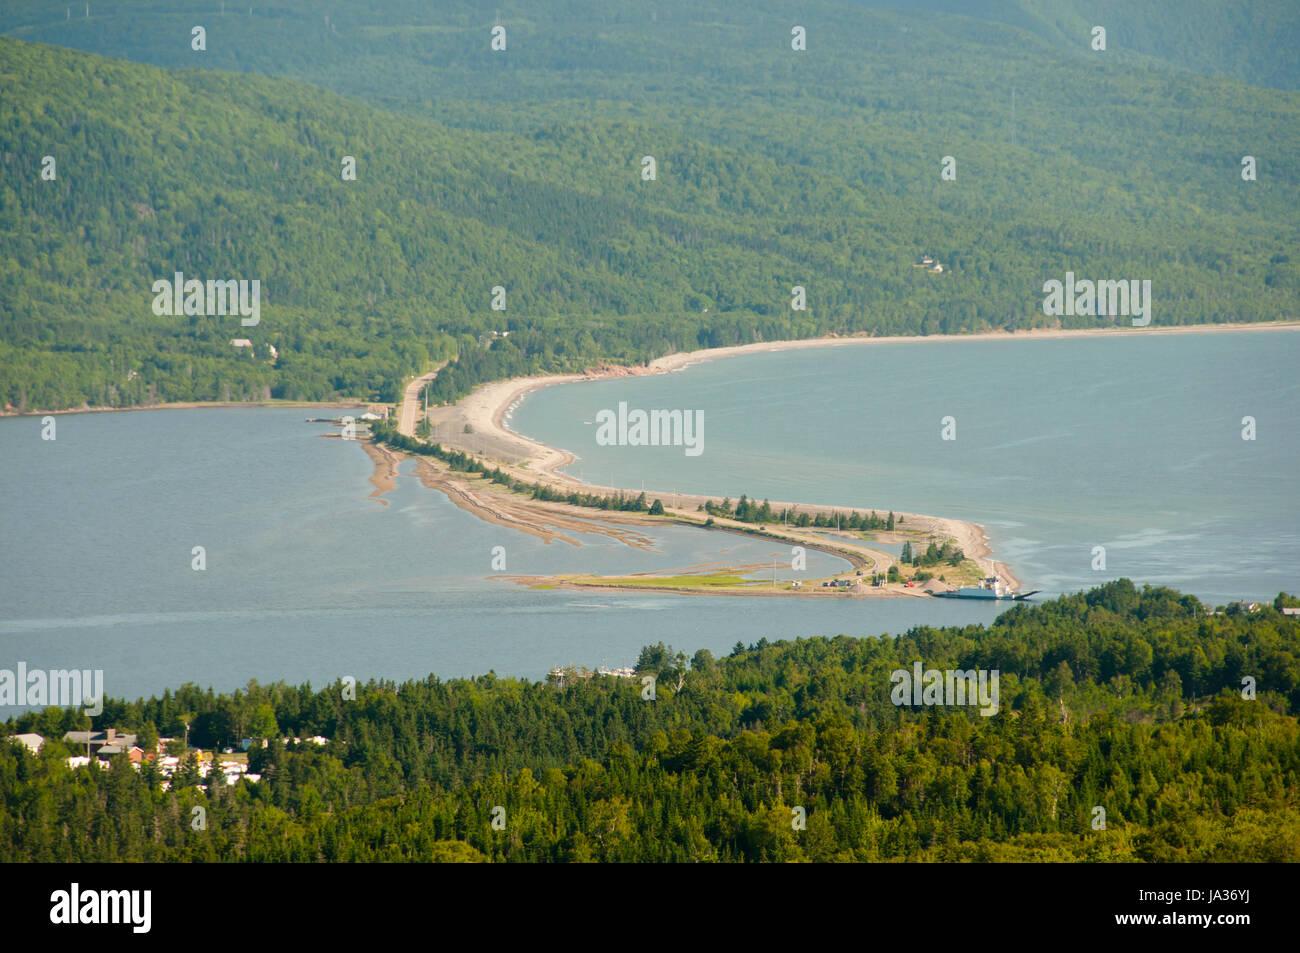 Great Bras D'Or - Nova Scotia - Canada - Stock Image